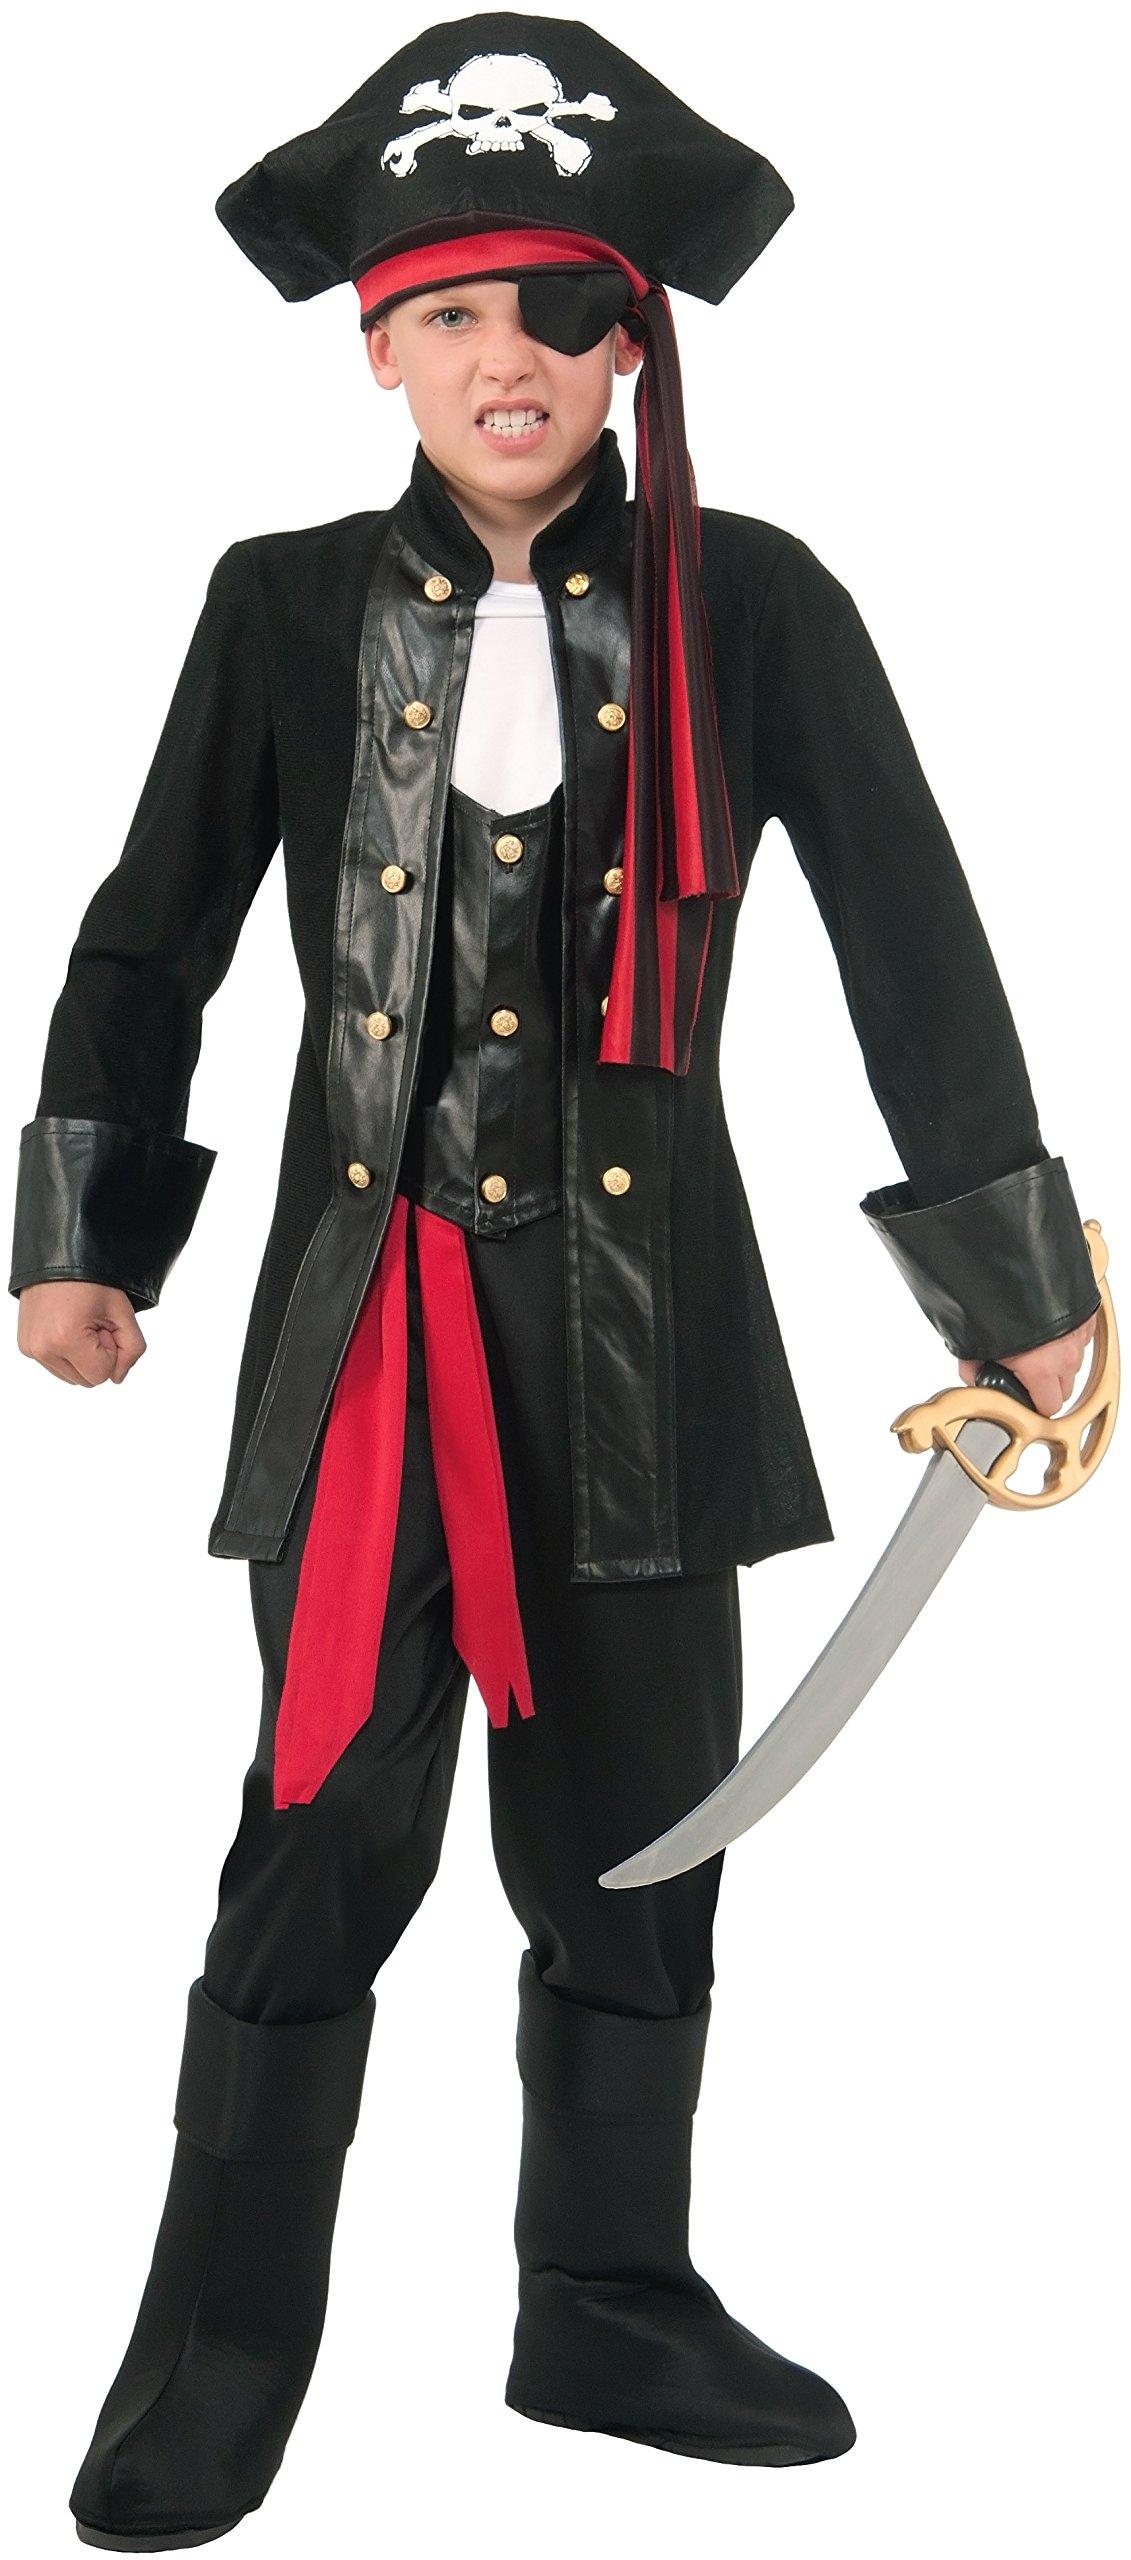 Seven Seas Boys Pirate Costume (Medium 8-10) by Forum Novelties